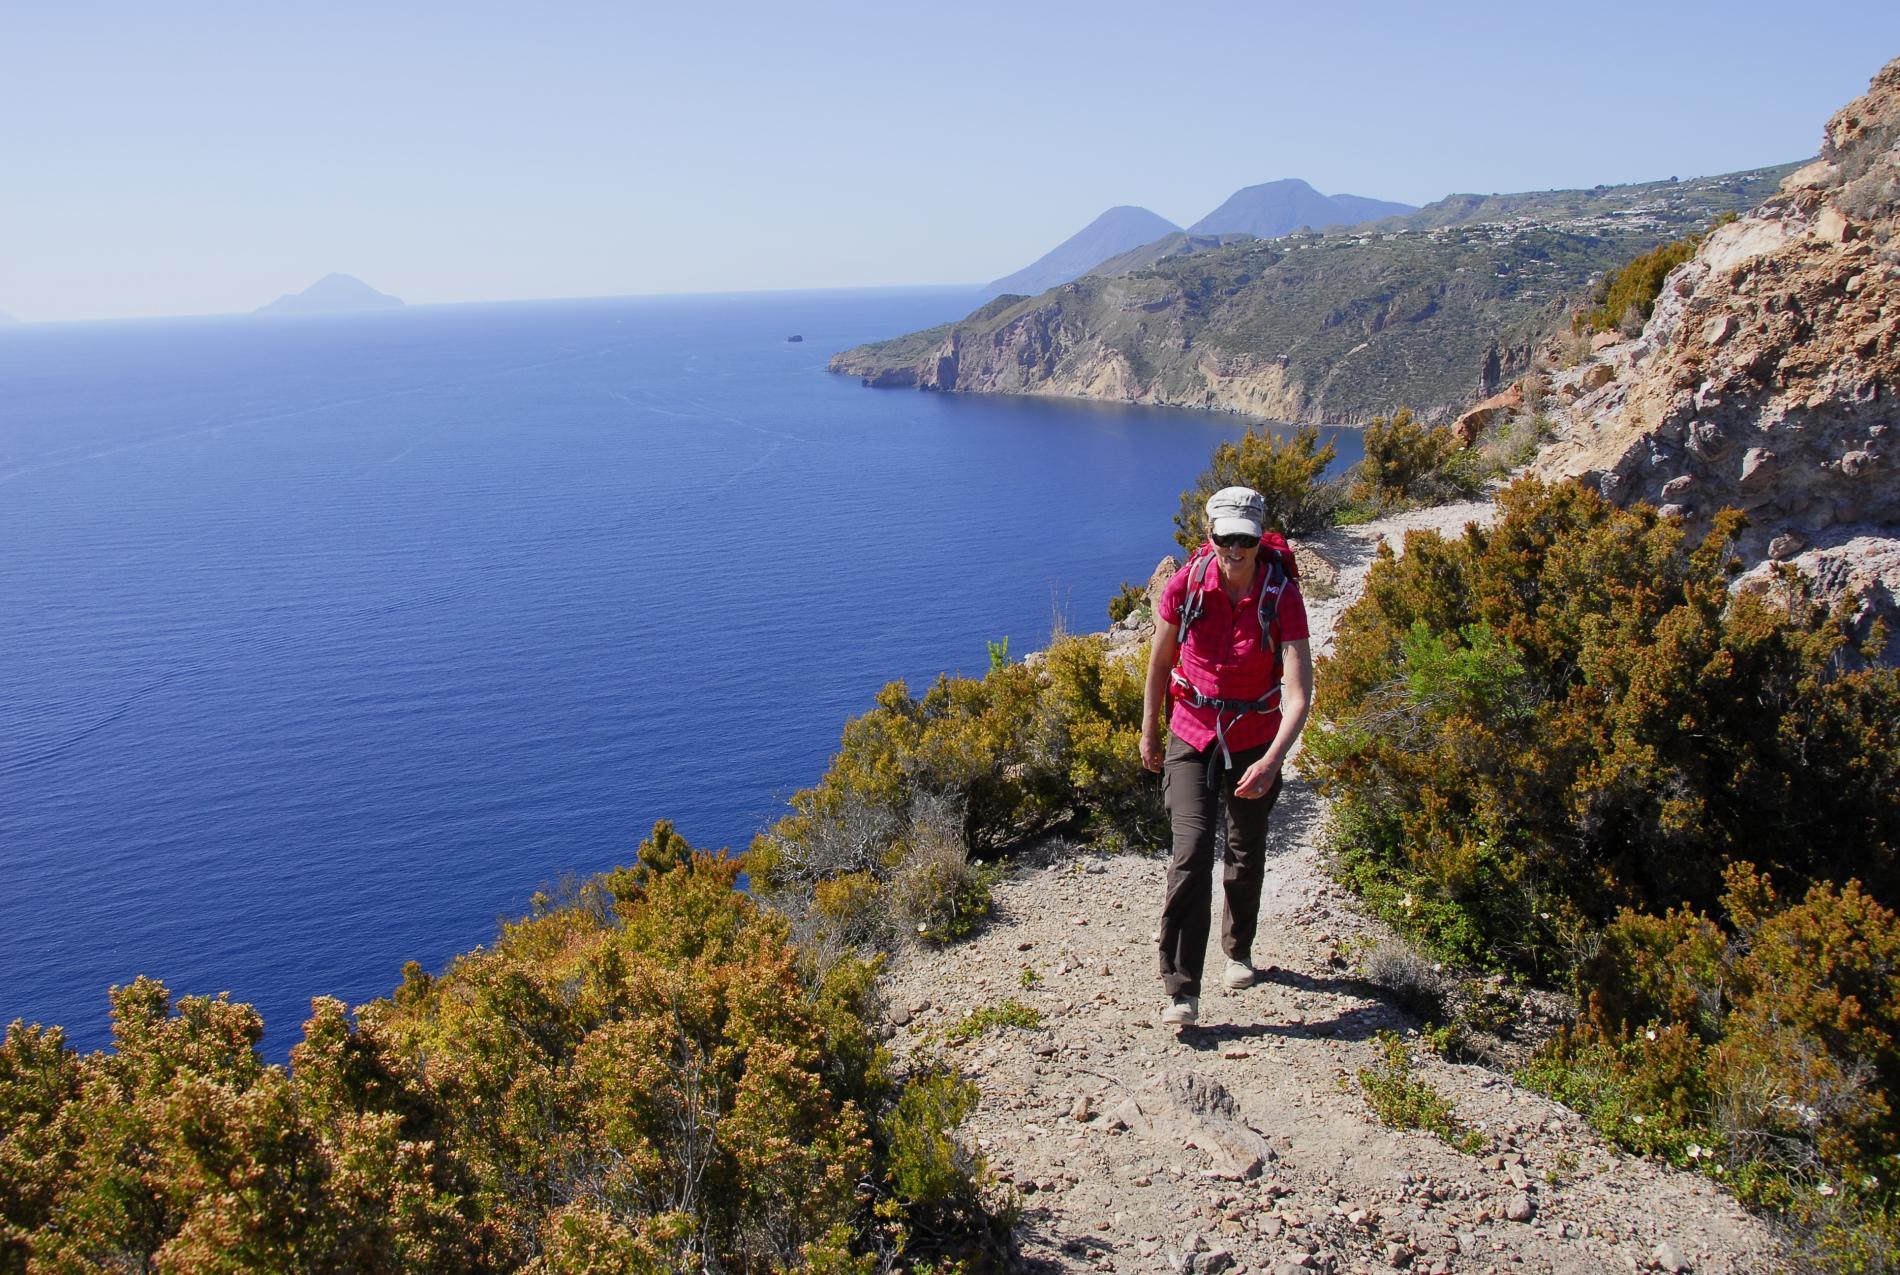 Voyage solidaire Italie : Vision du Monde - Photo 1